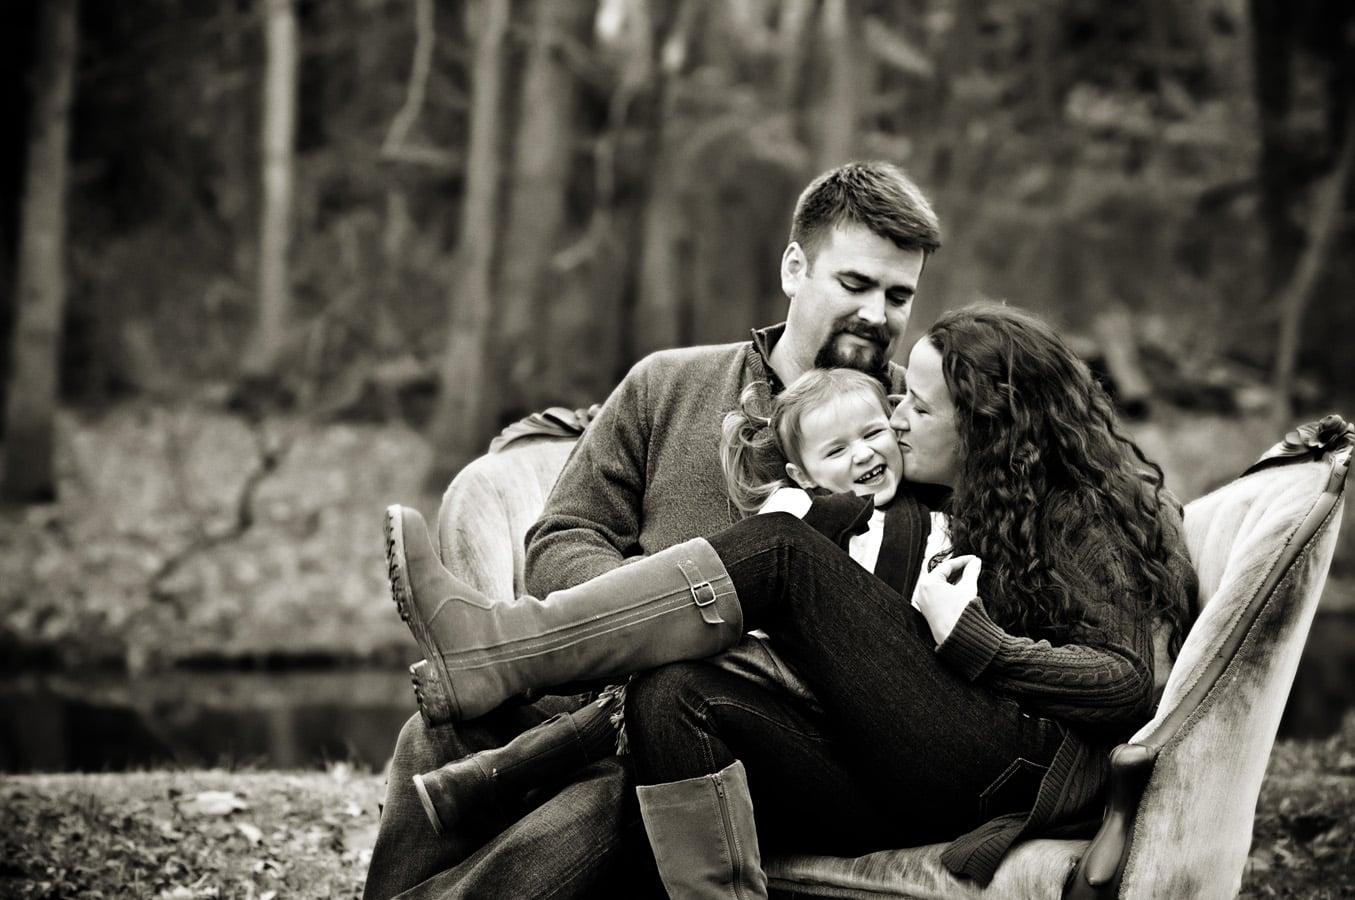 family portrait, sofa, outdoor, natural light, Northern VA